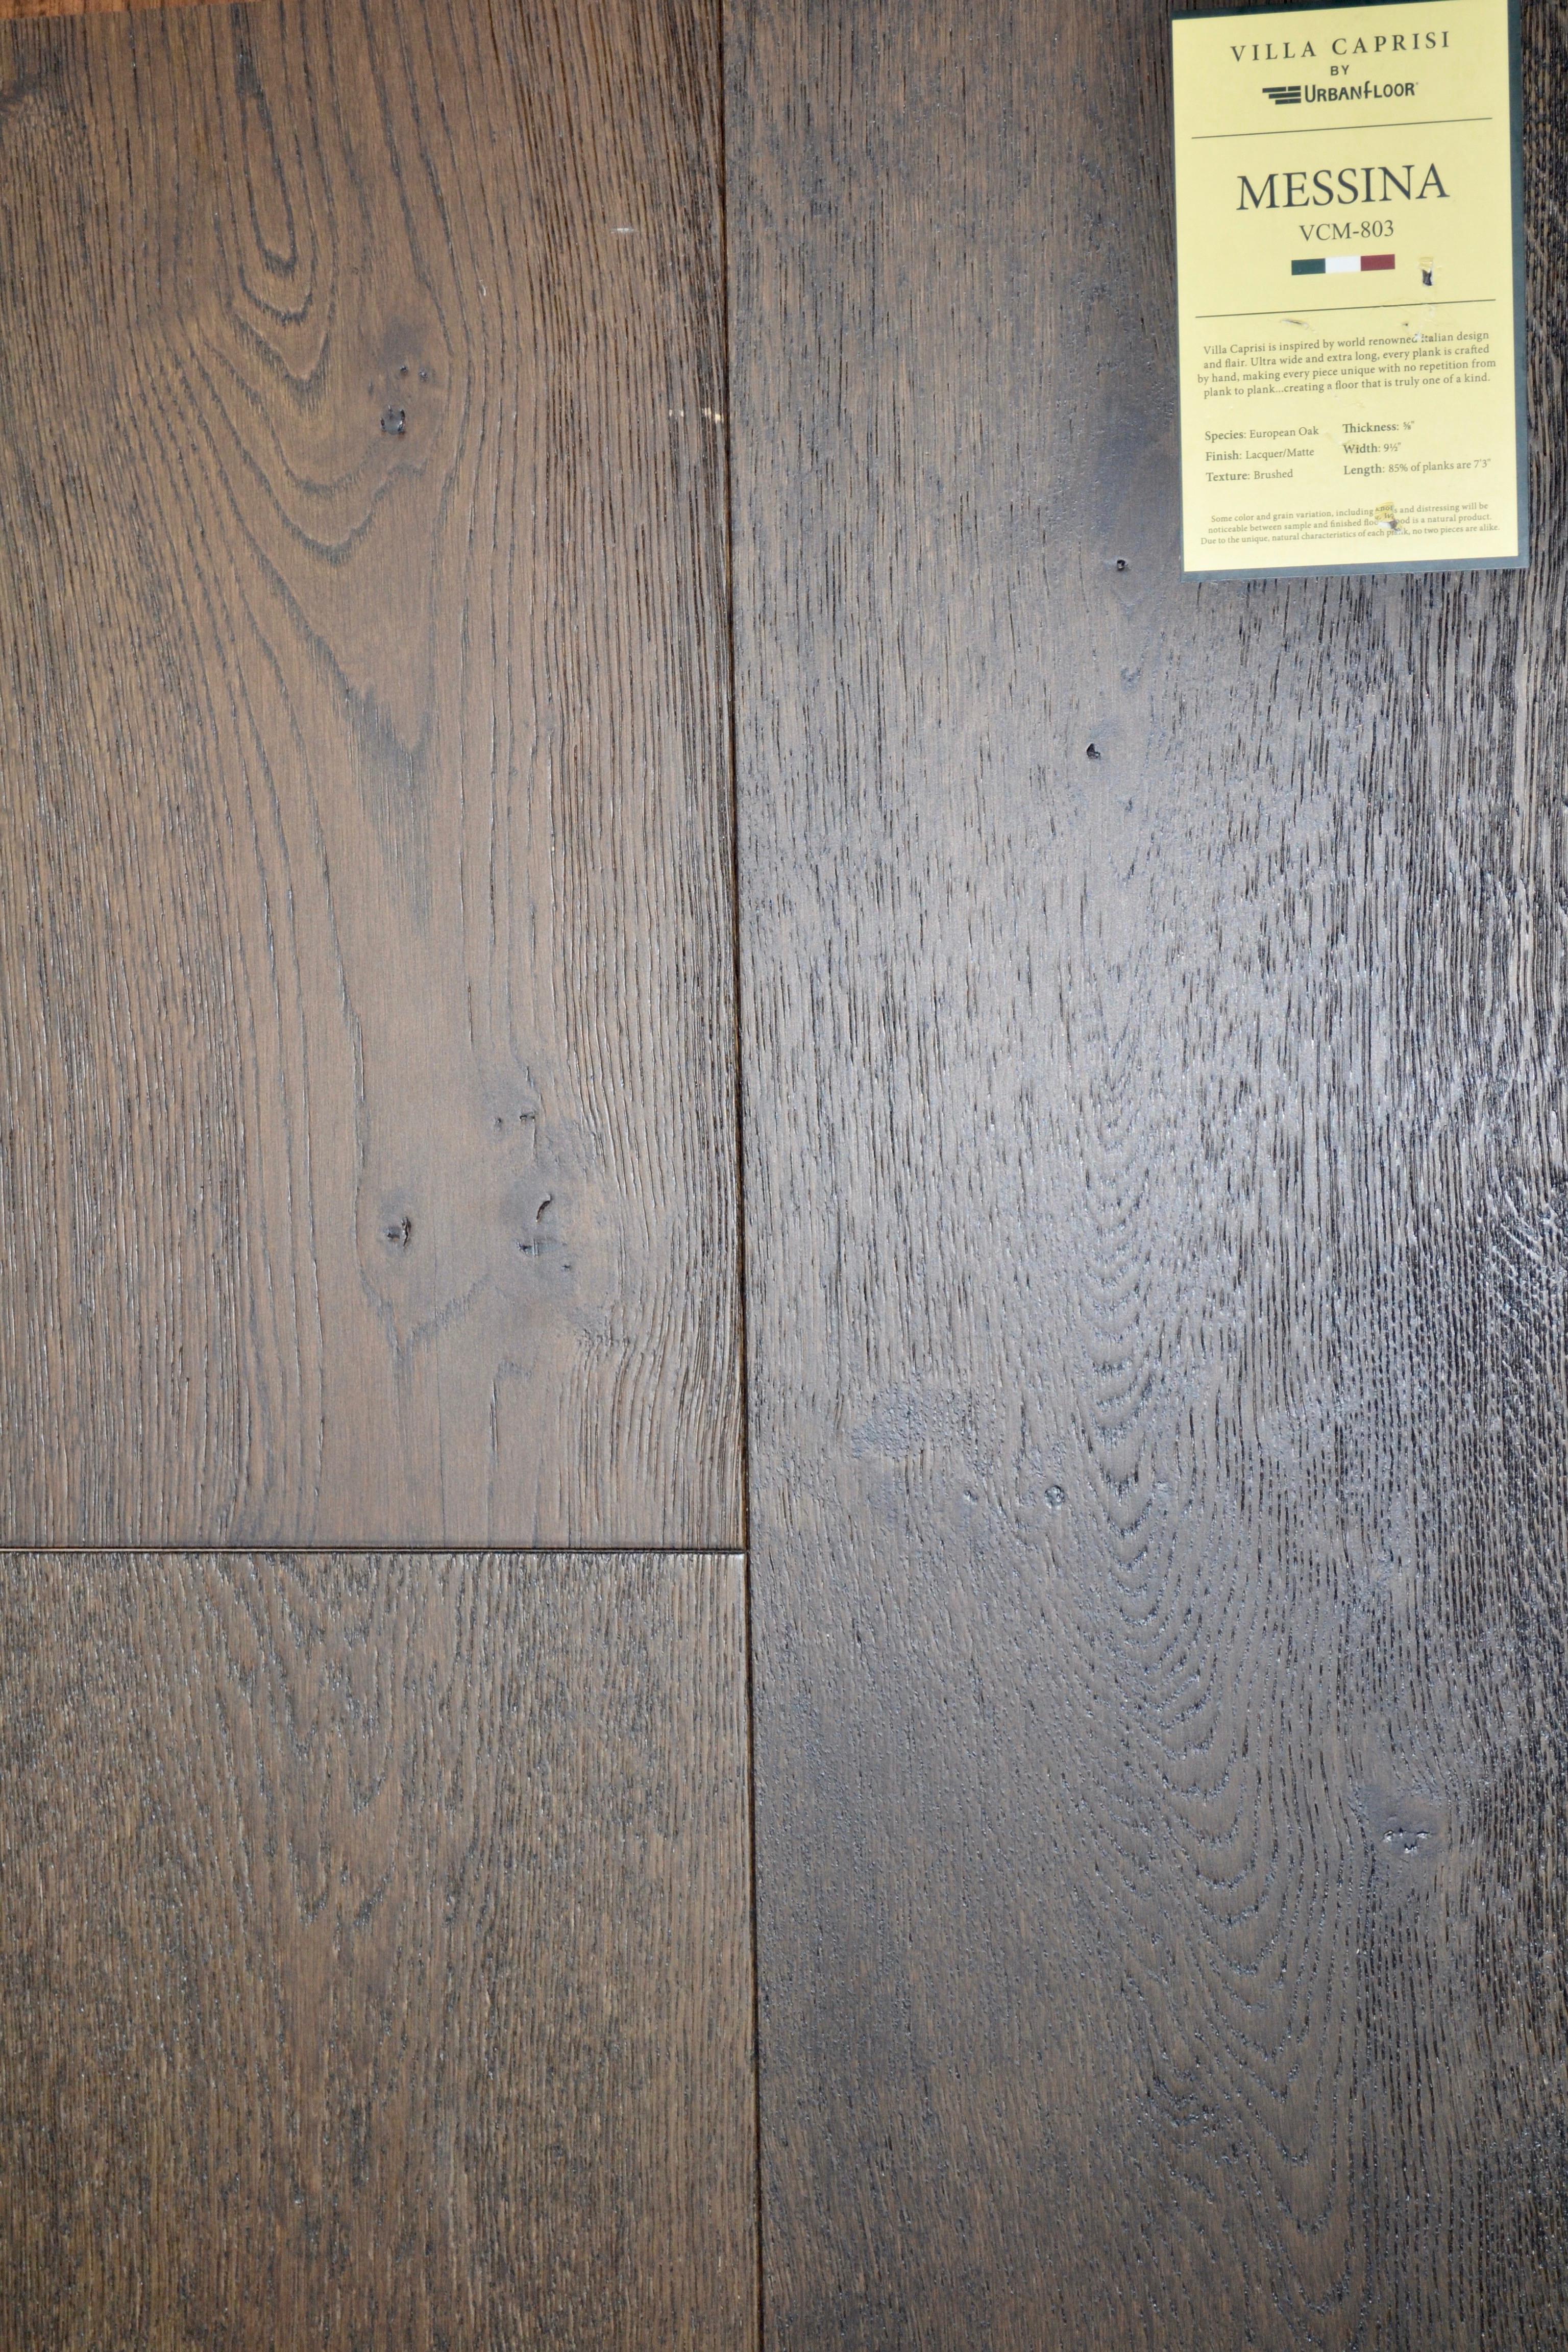 engineered hardwood flooring vs laminate flooring of villa caprisi fine european hardwood millennium hardwood regarding european style inspired designer oak floor messina by villa caprisi